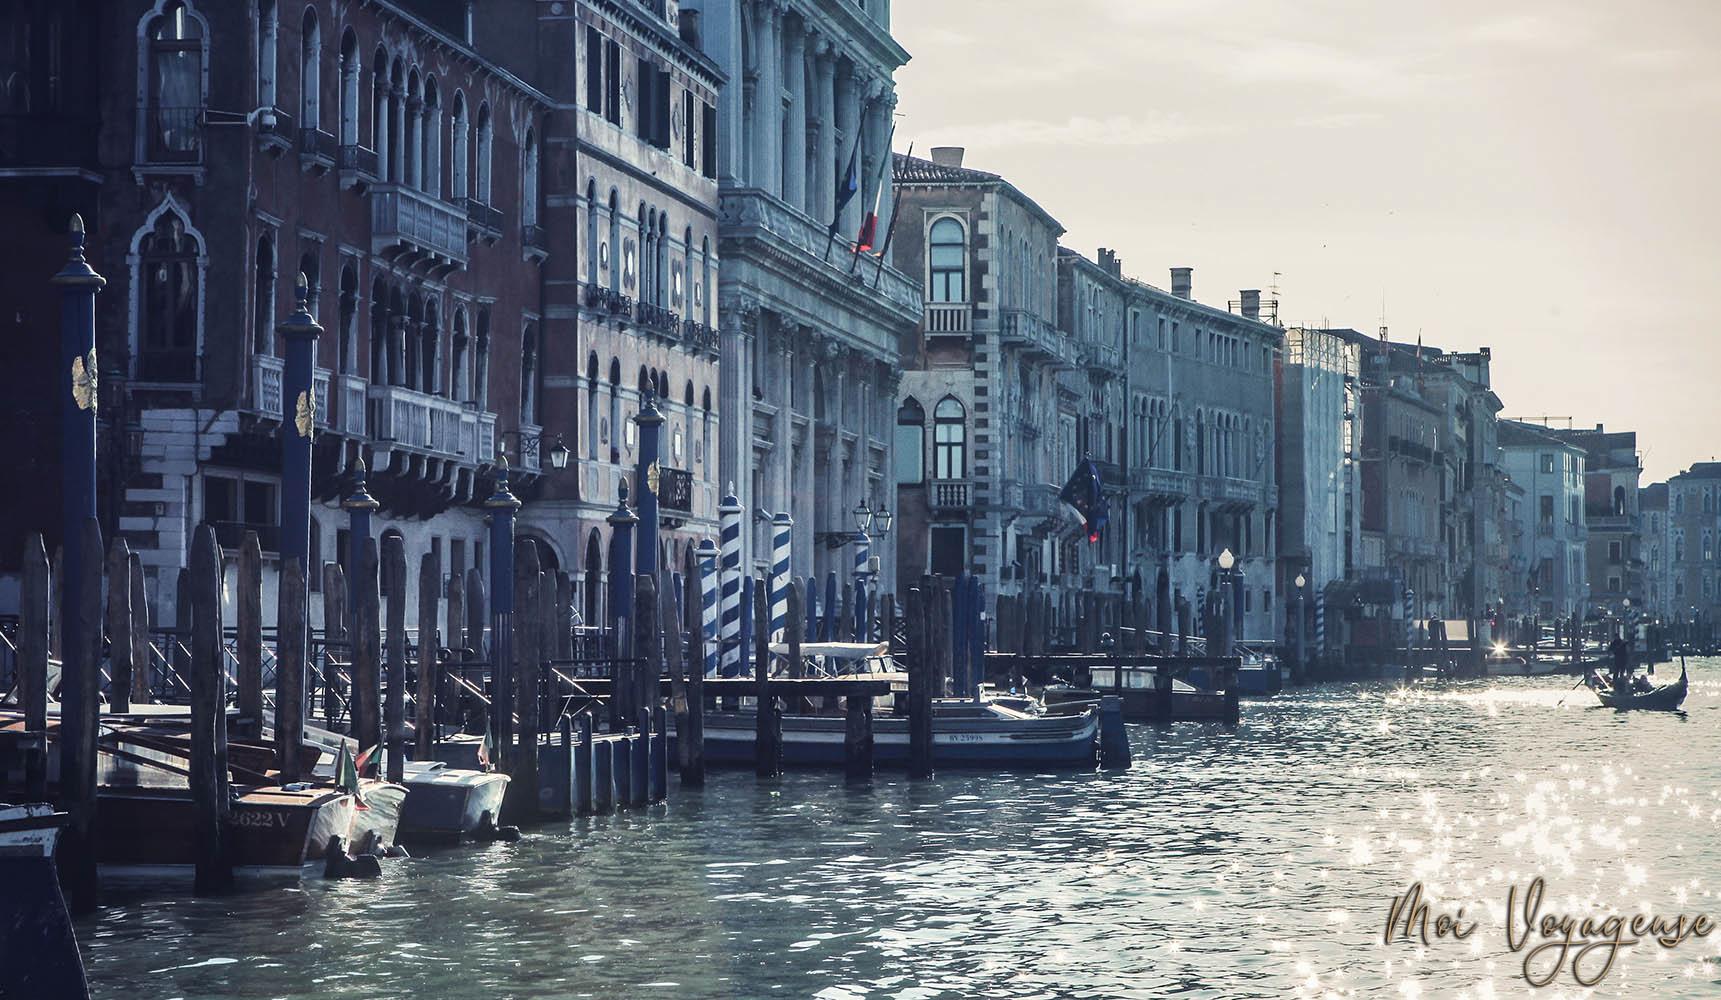 Grand Canal de Venise Italie Europe